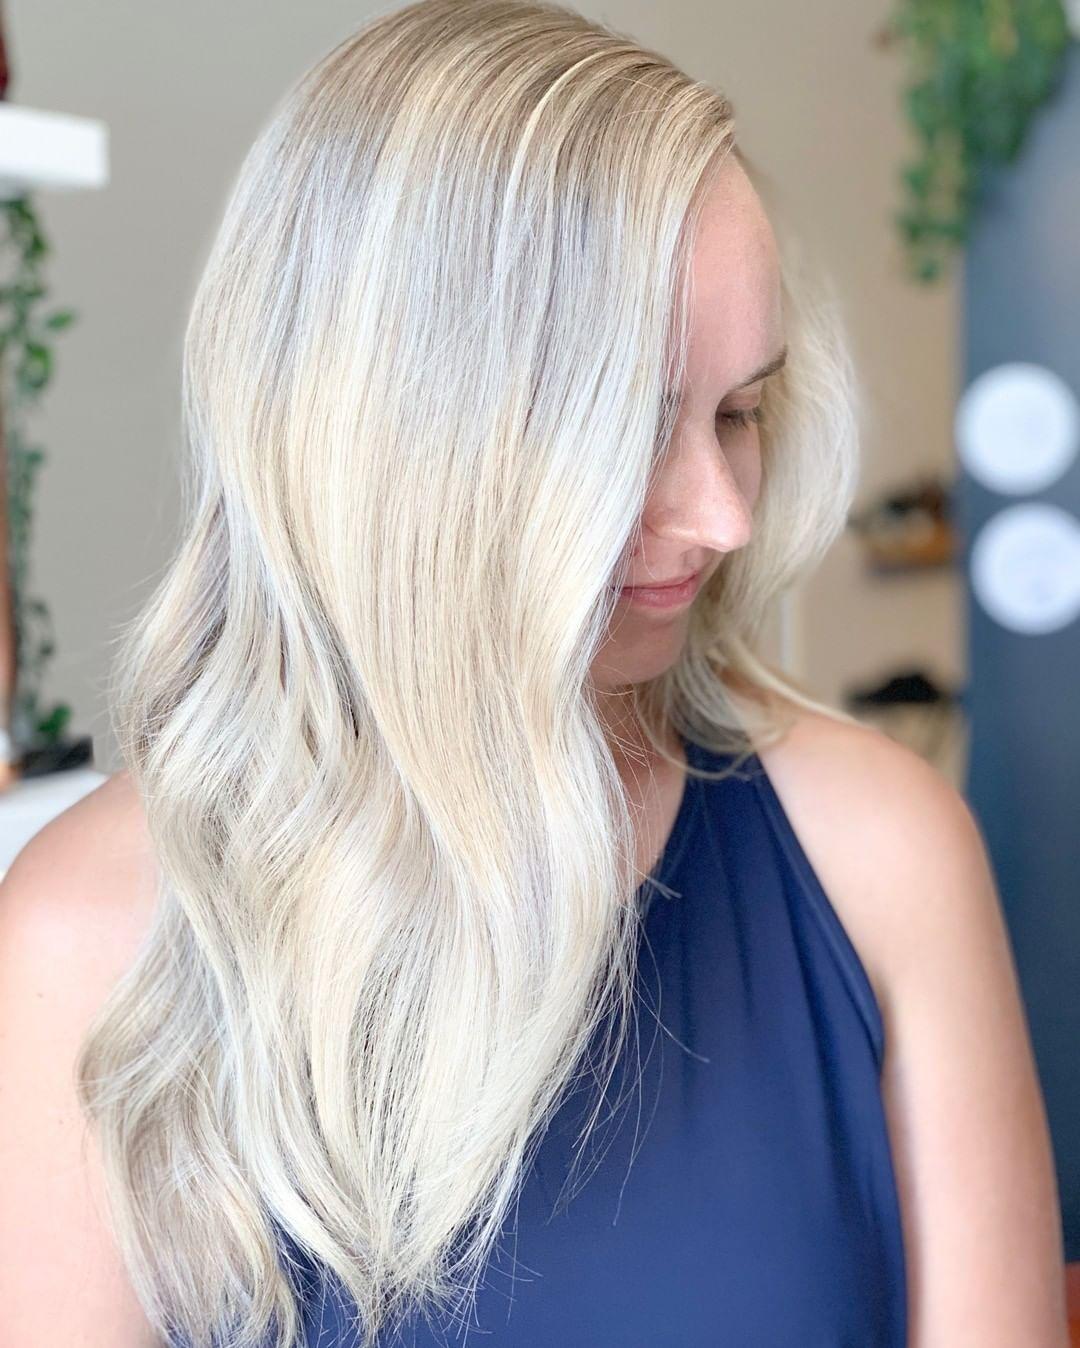 cute light blonde hair style